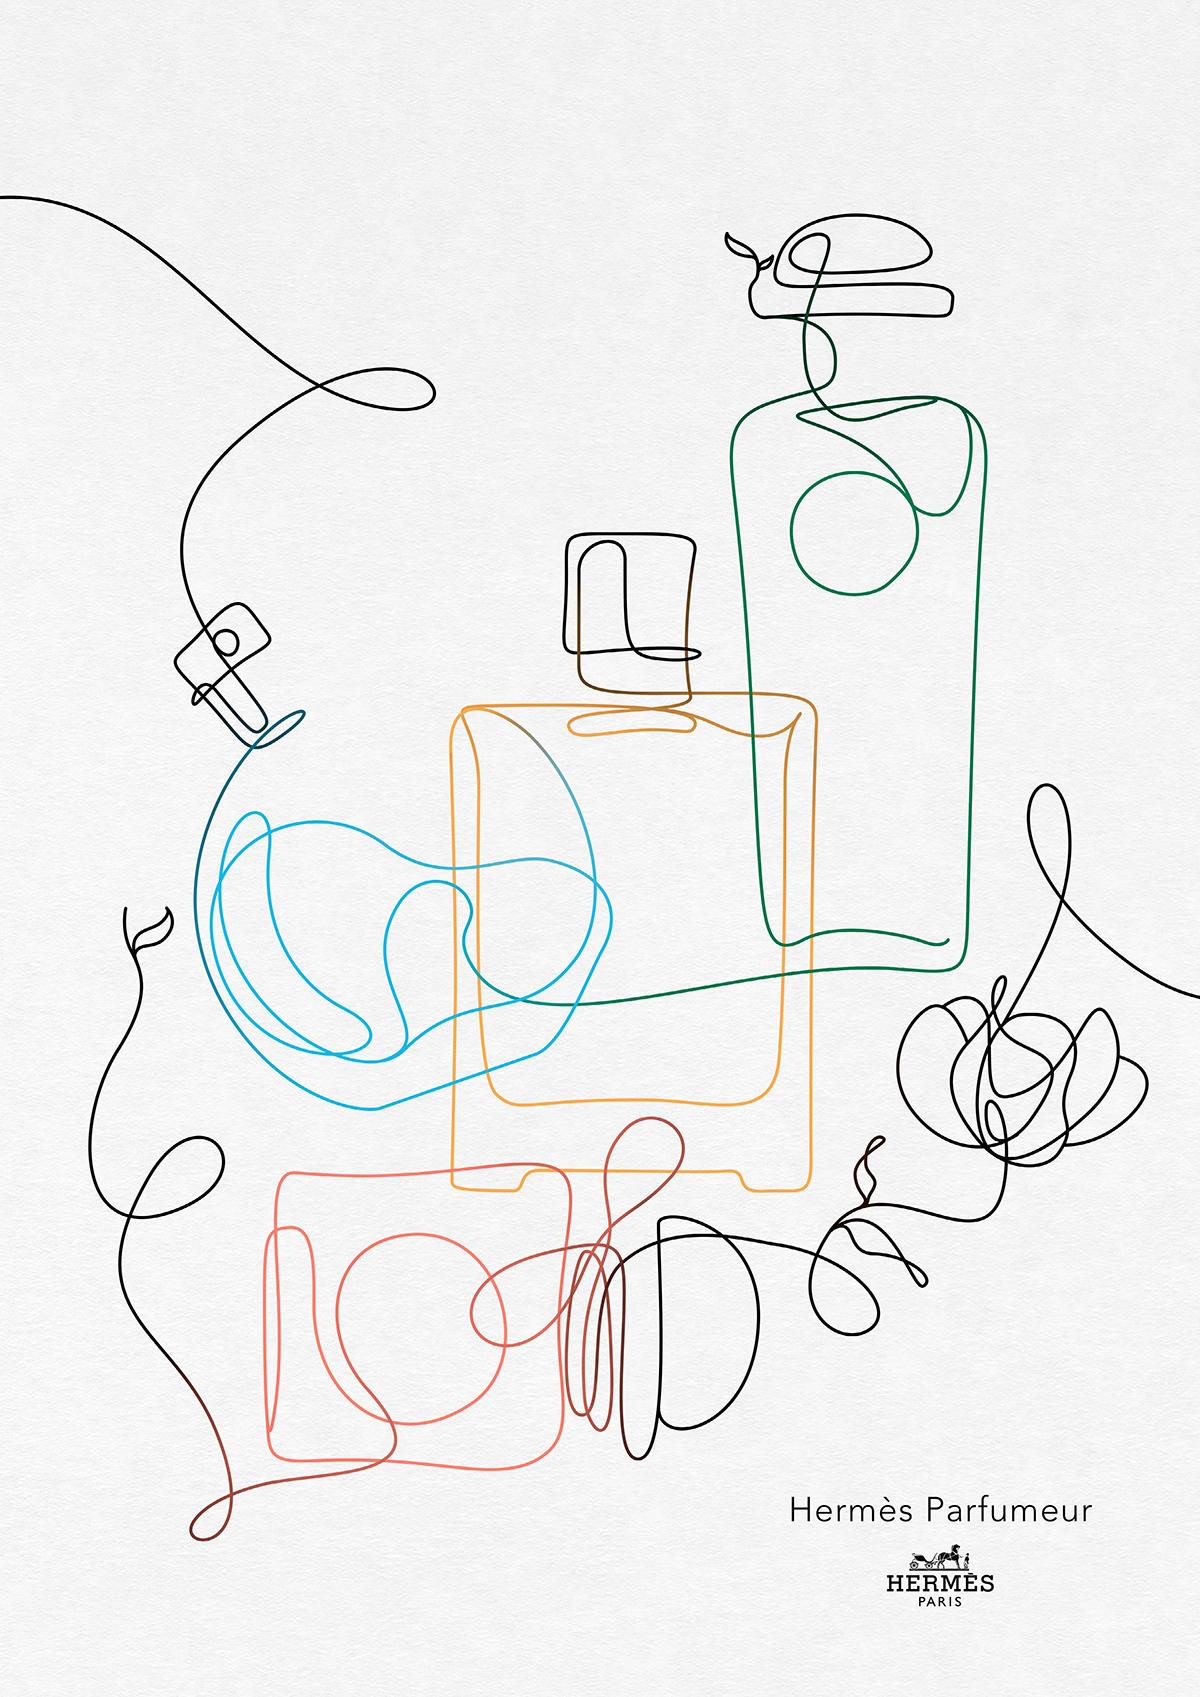 HERMES_ouverture.jpg